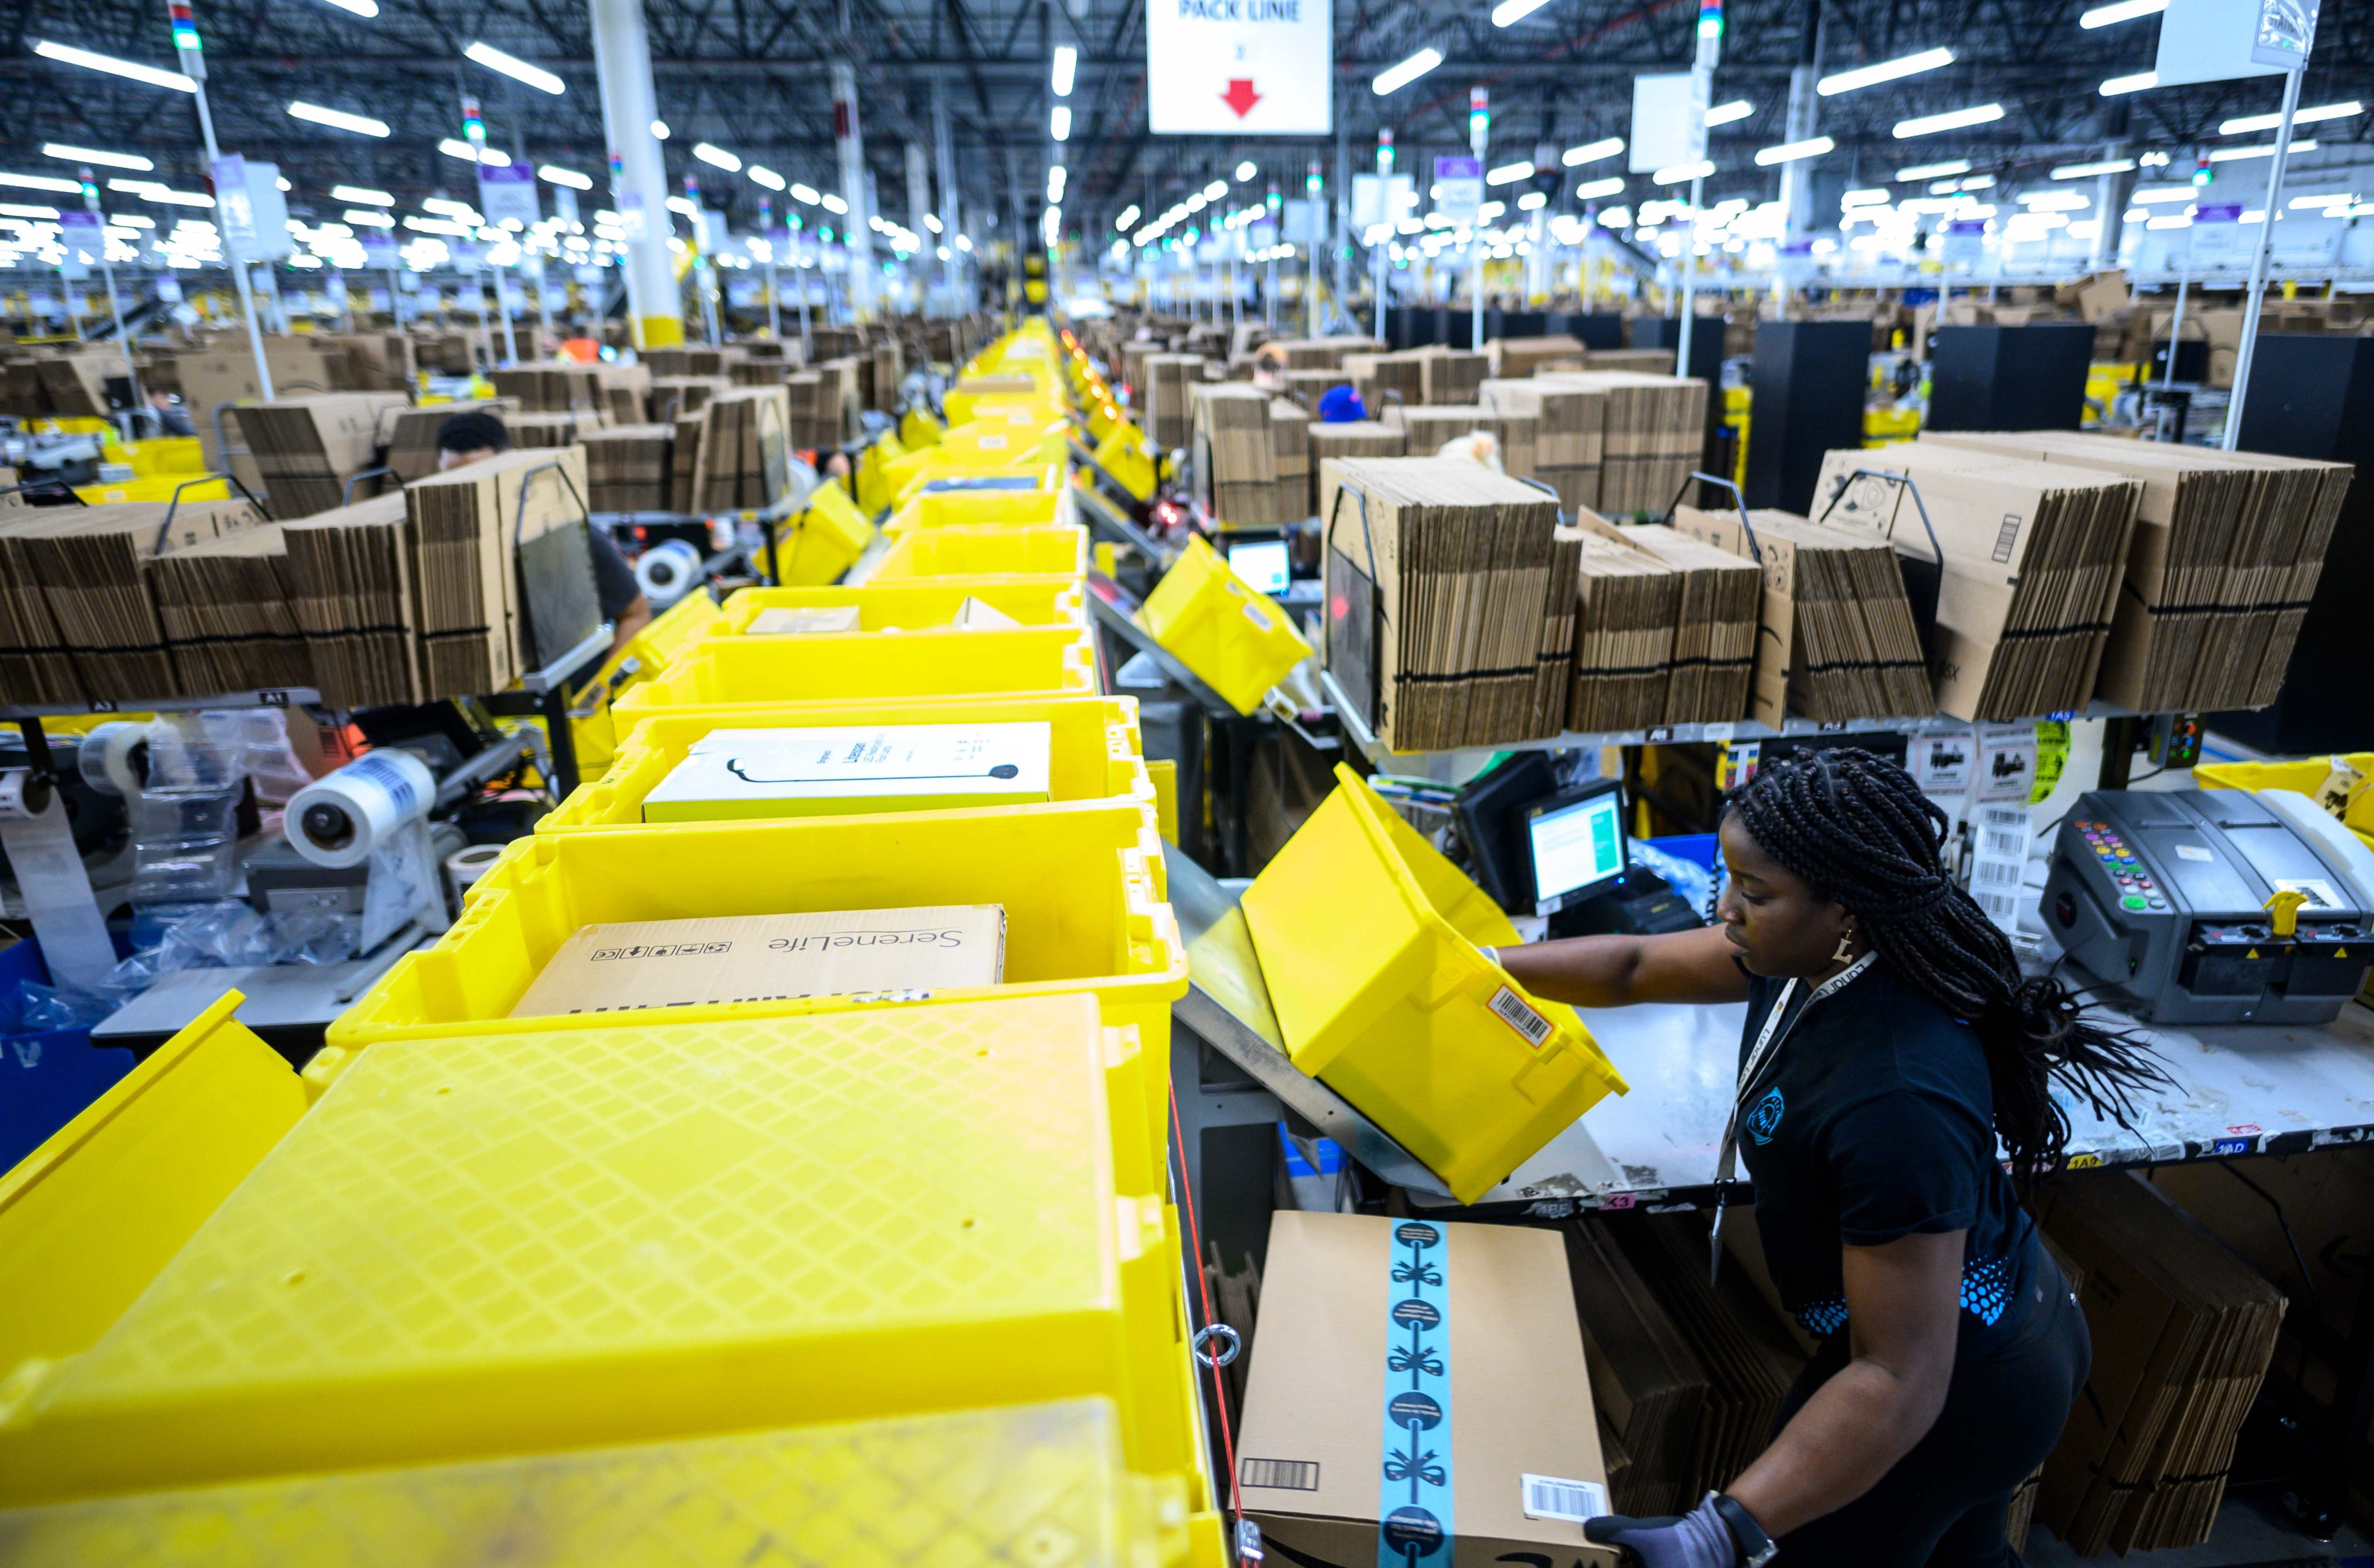 Legal Institute on Southern University: EU bør undersøge Amazon for spionage